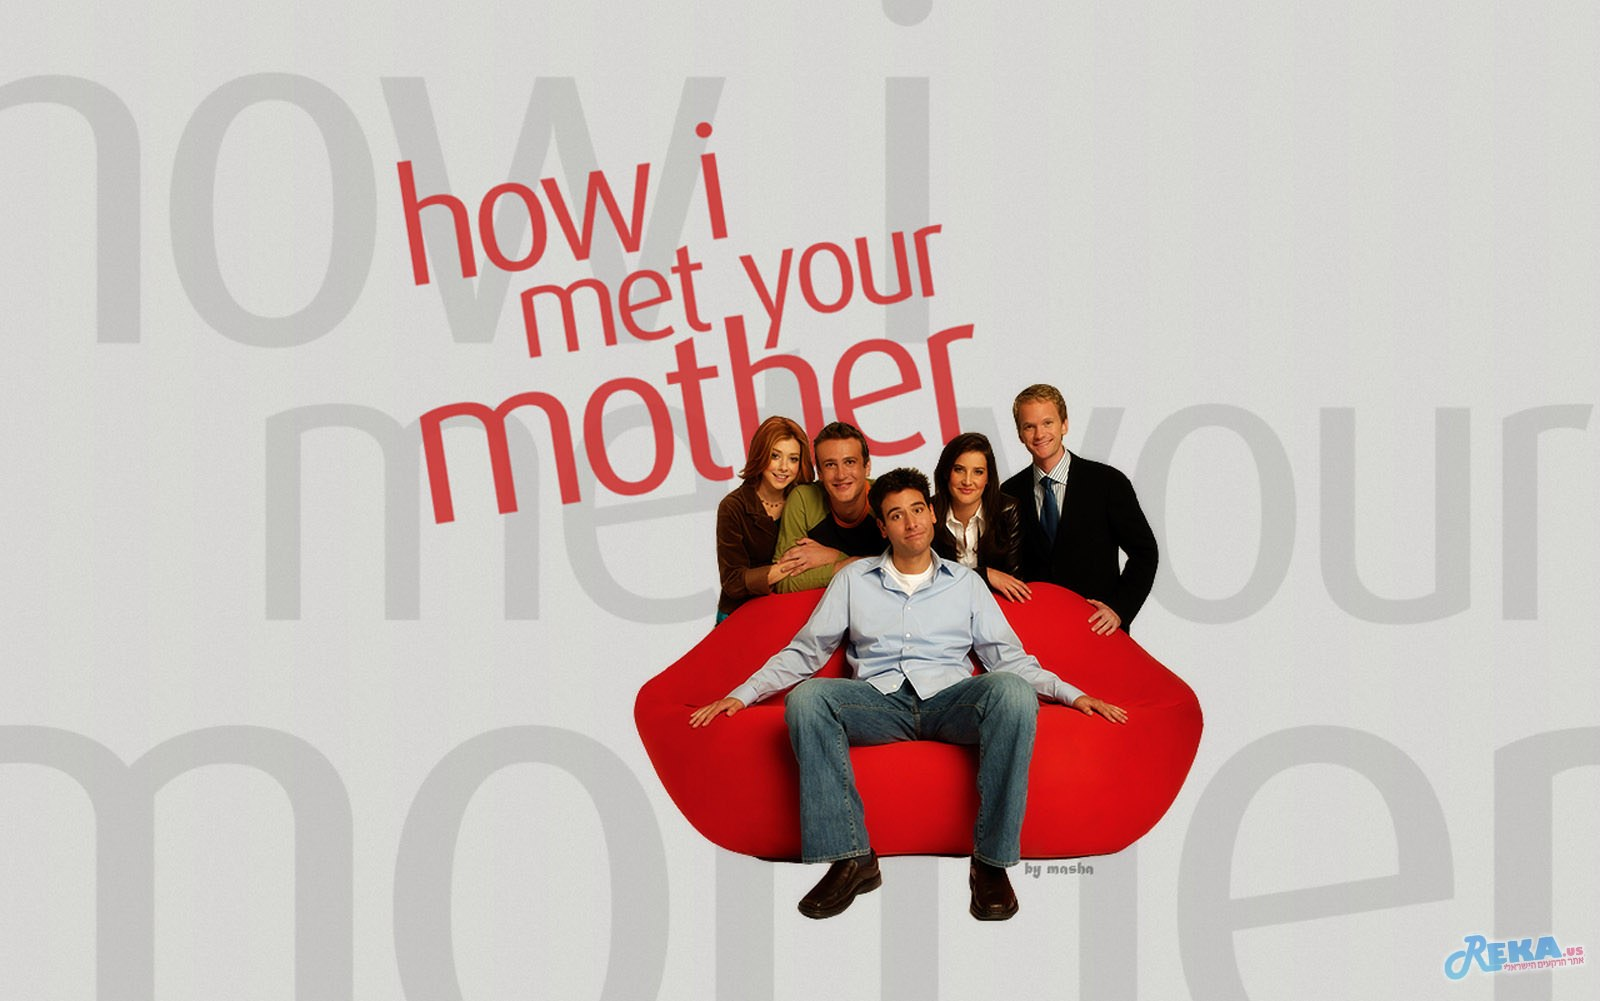 how-i-met-you-mother-how-i-met-your-mother-10780622-1280-800